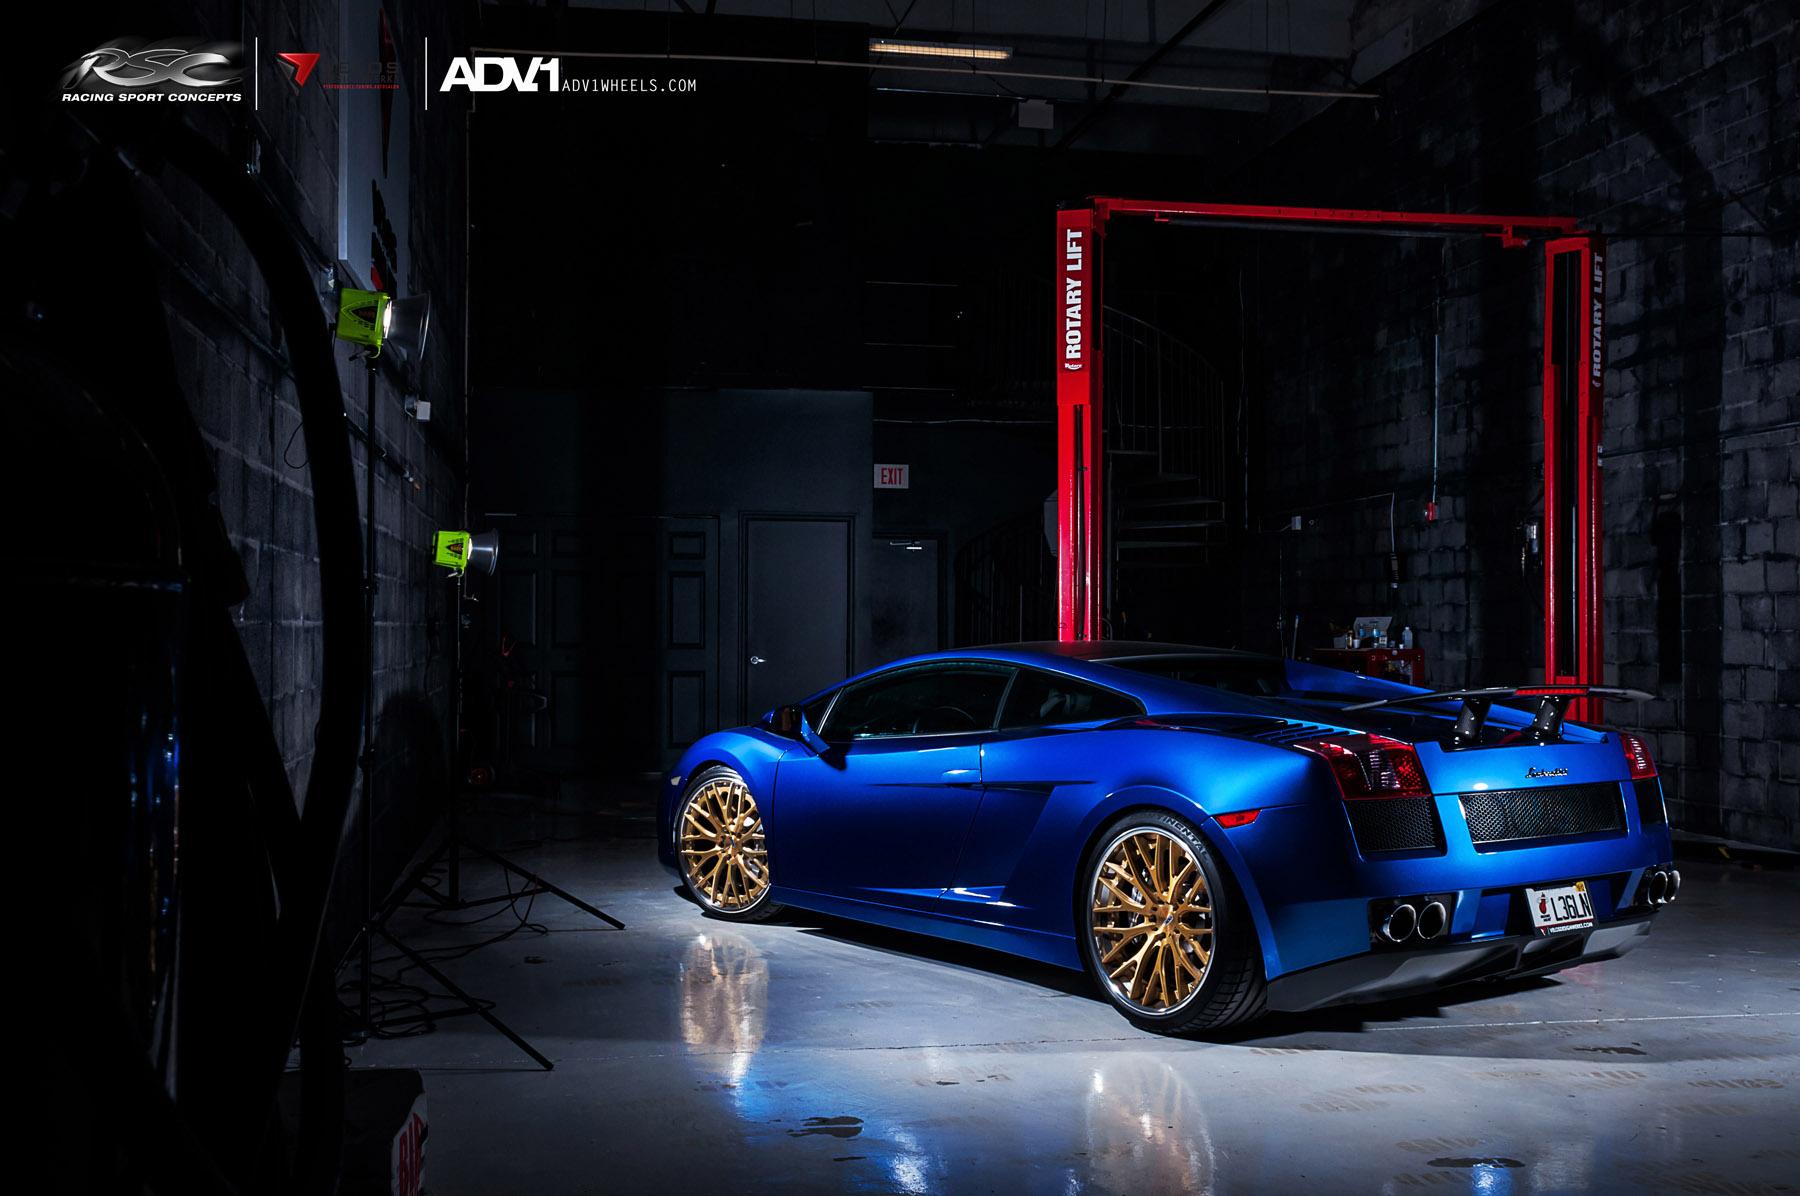 ADV.1 колеса Lamborghini Gallardo ADV10.0TS SL Gold Edition  - фотография №6